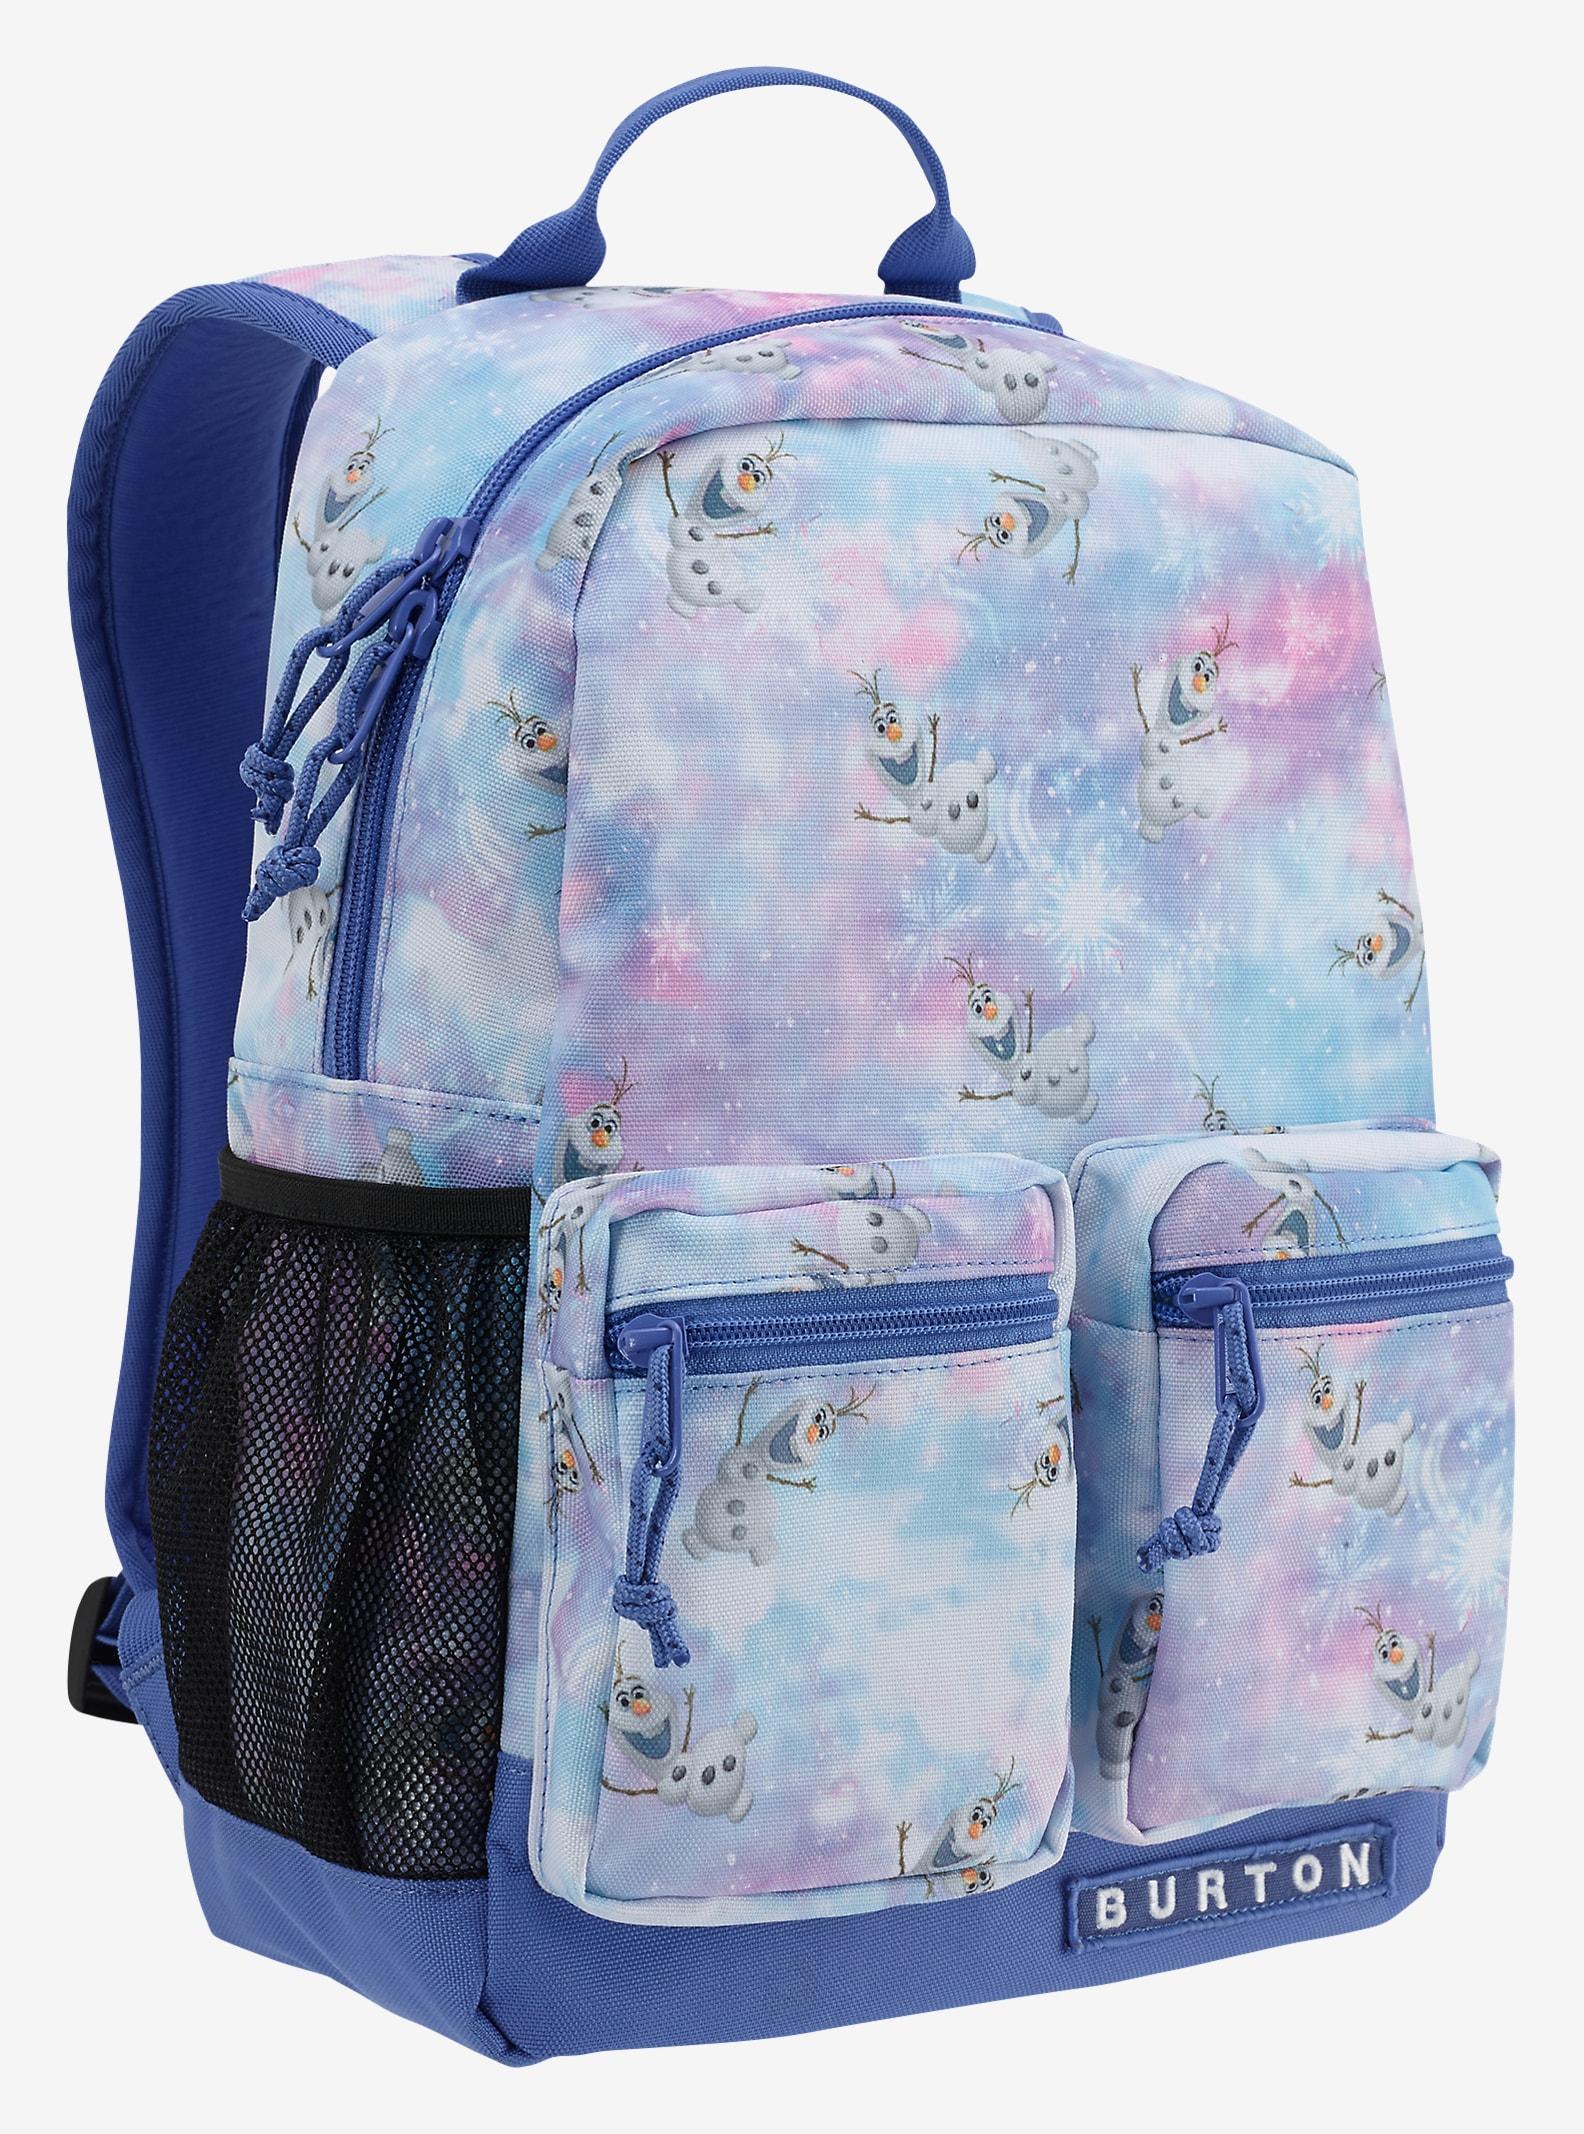 Disney Frozen Kids' Gromlet Backpack shown in Olaf Frozen Print © Disney